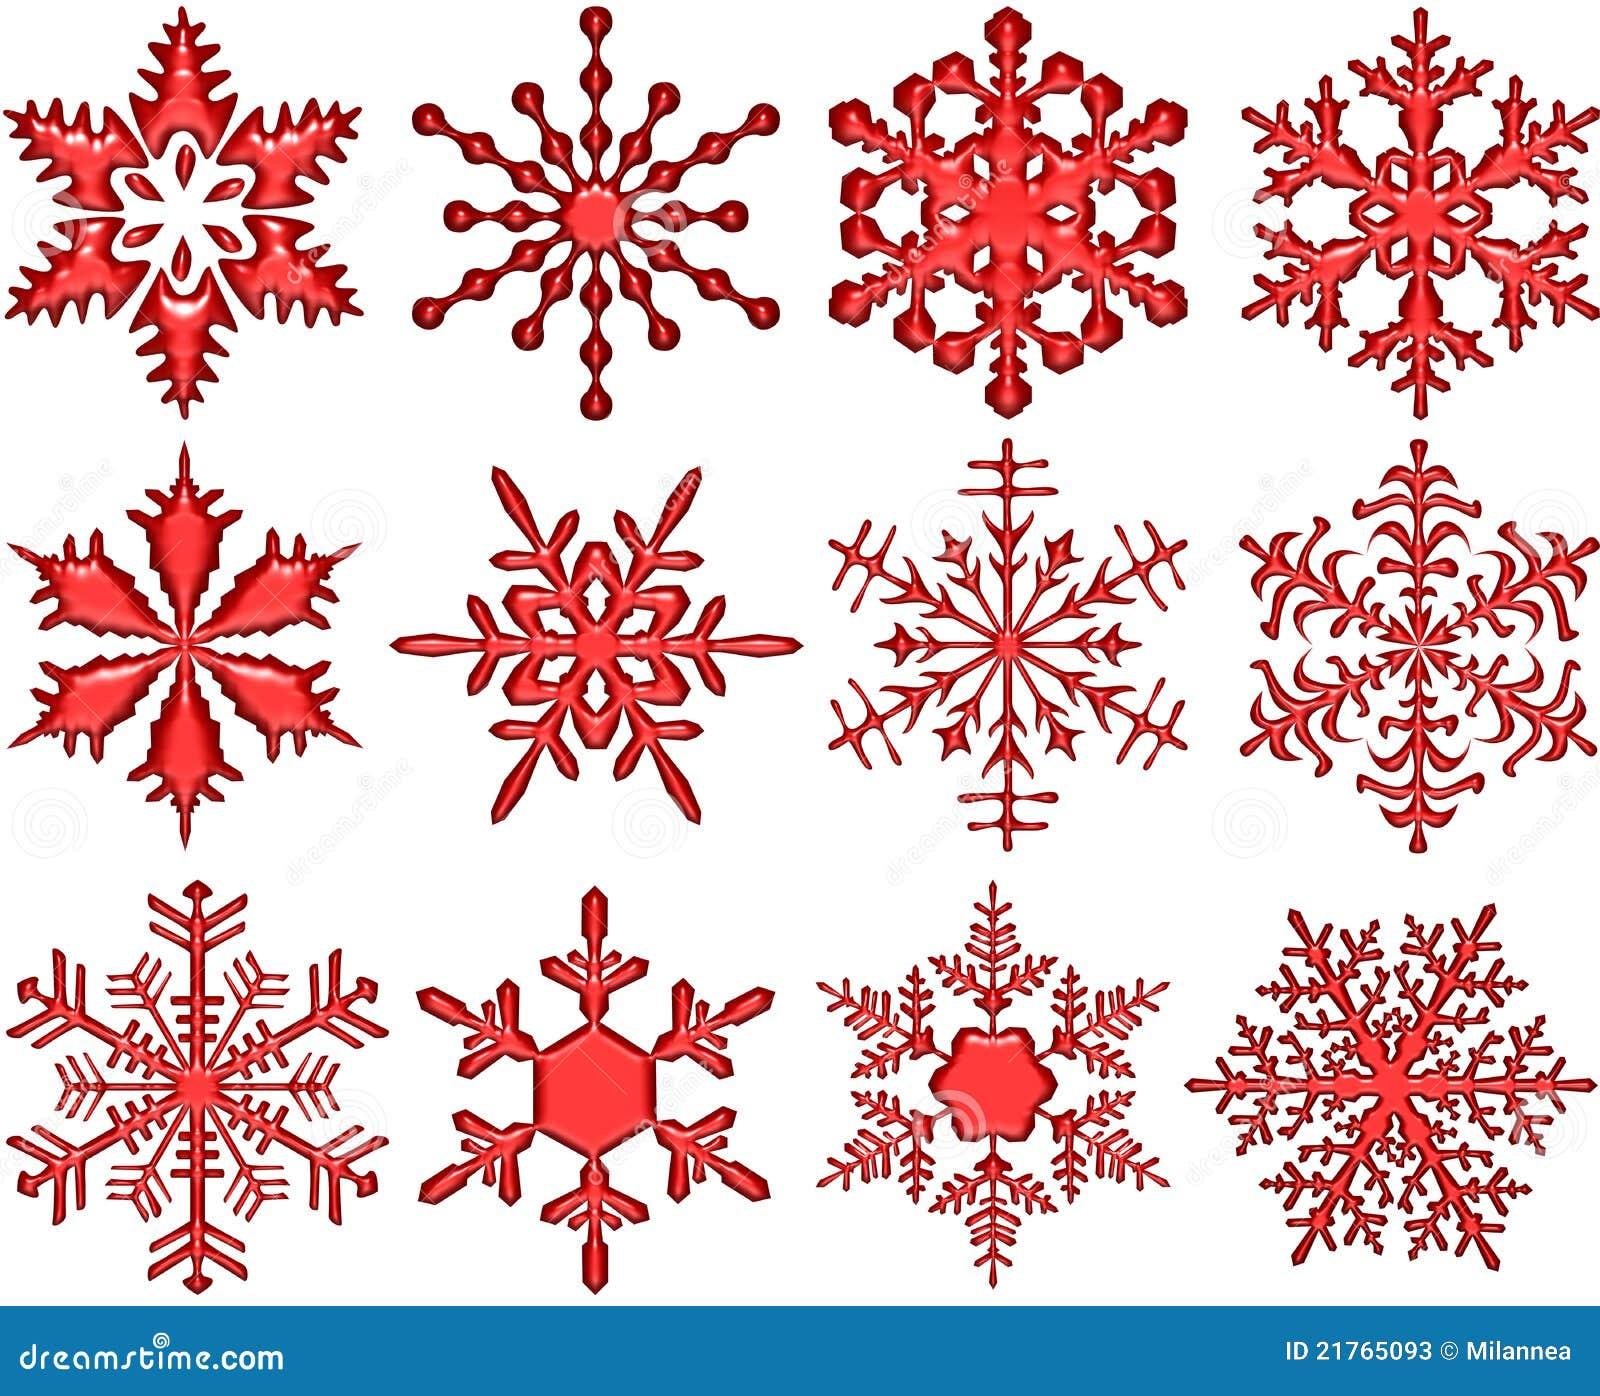 snowflake divorced singles University college london posted a tweet  'snowflake students' force london  novak djokovic and angelique kerber celebrate wimbledon singles titles at star.